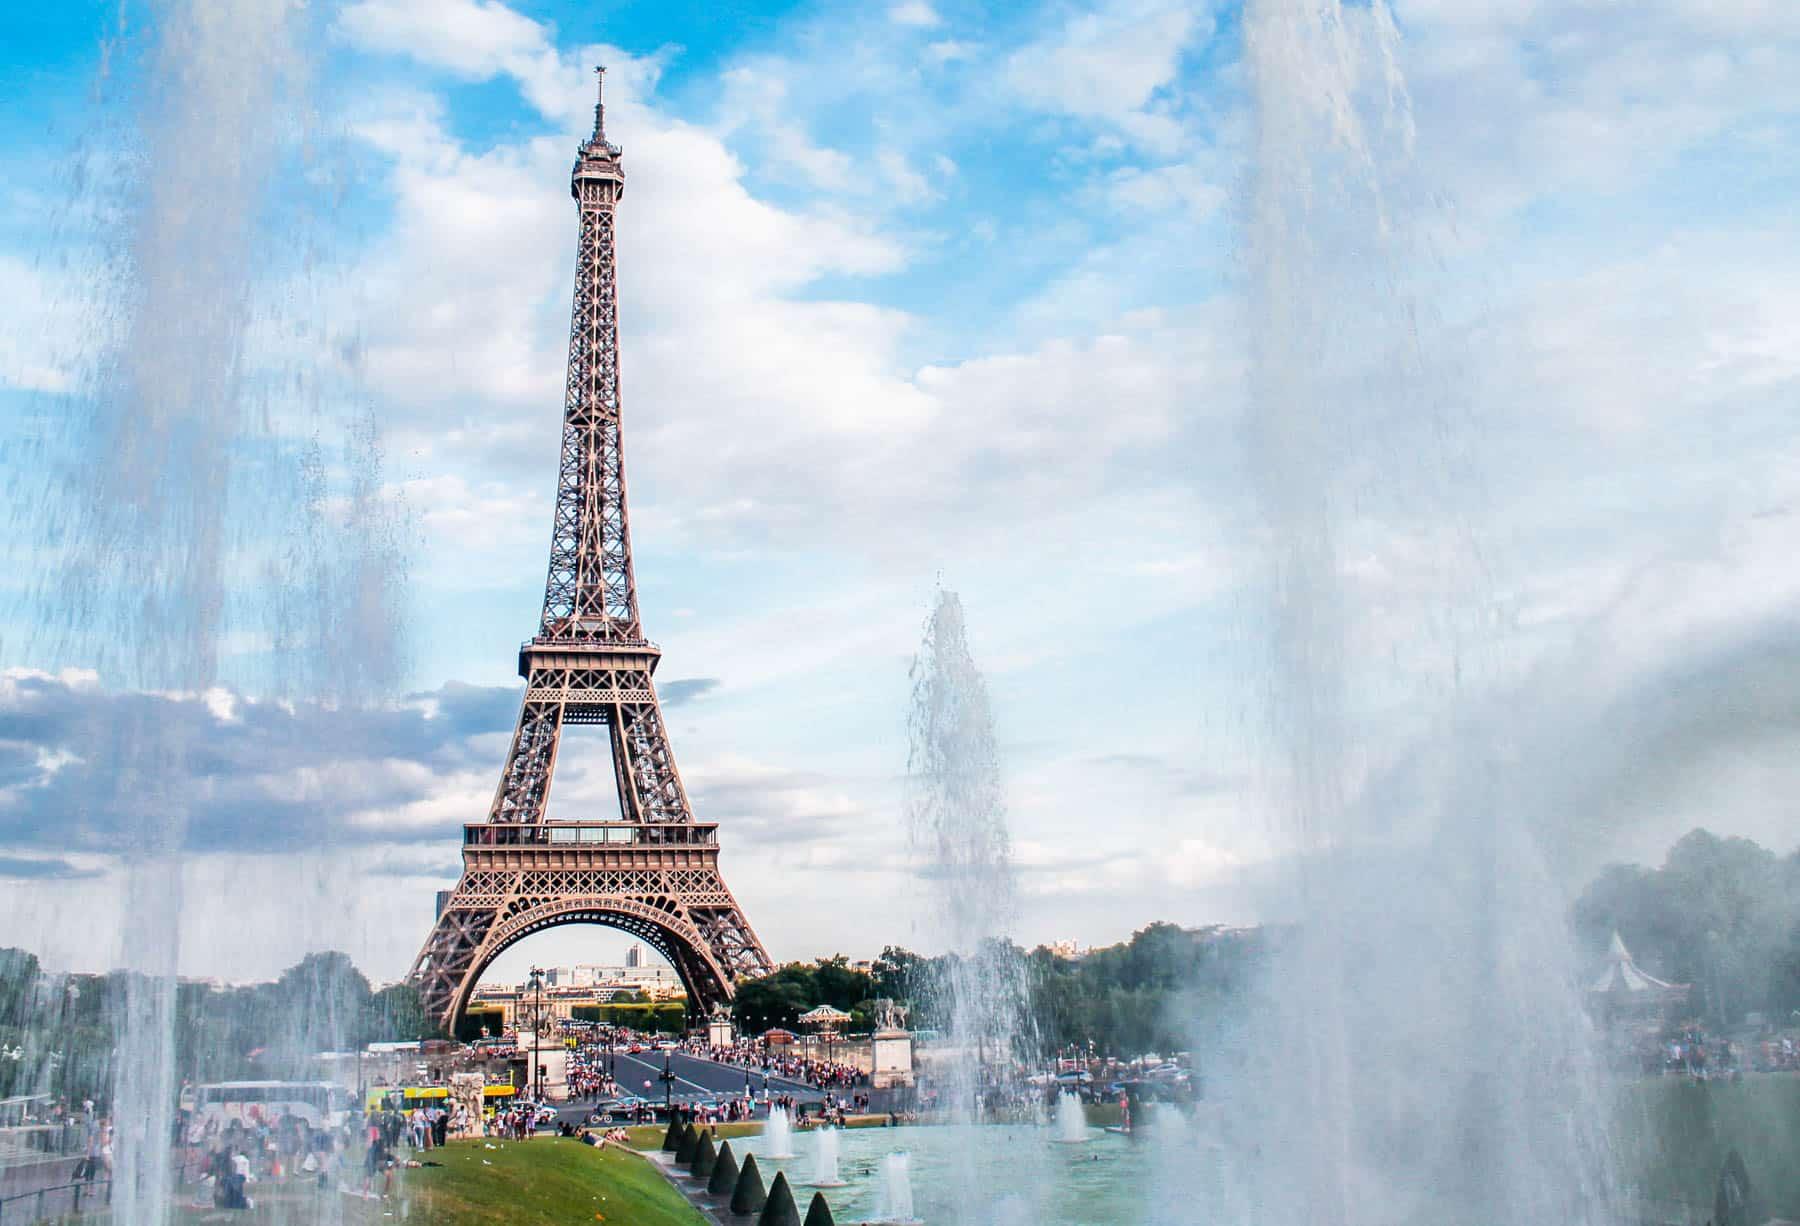 paris the city of love essay David webb @davidebwebb march 15, 2017 i-love-paris  one of our favourite  stops in the city—shakespeare & co, in paris's latin quarter seine-paris.